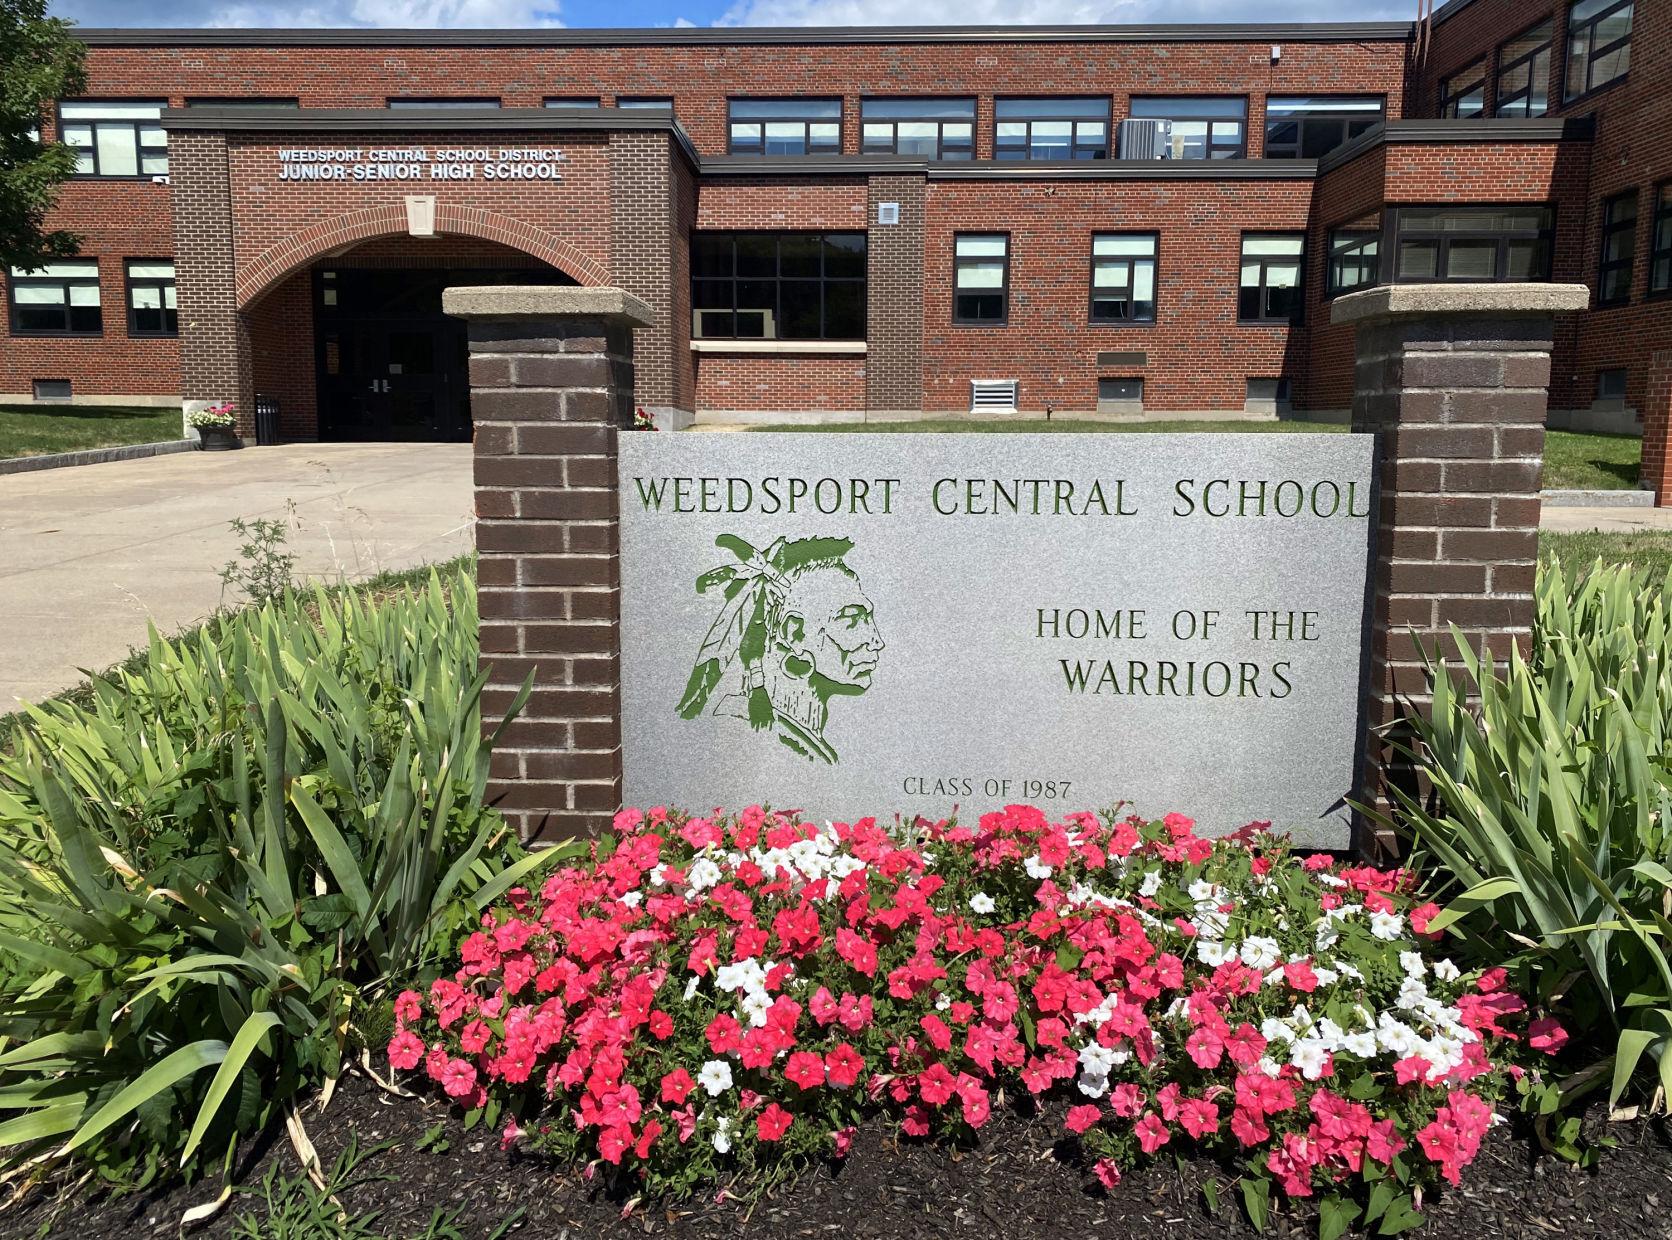 auburnpub.com - Weedsport Central School District